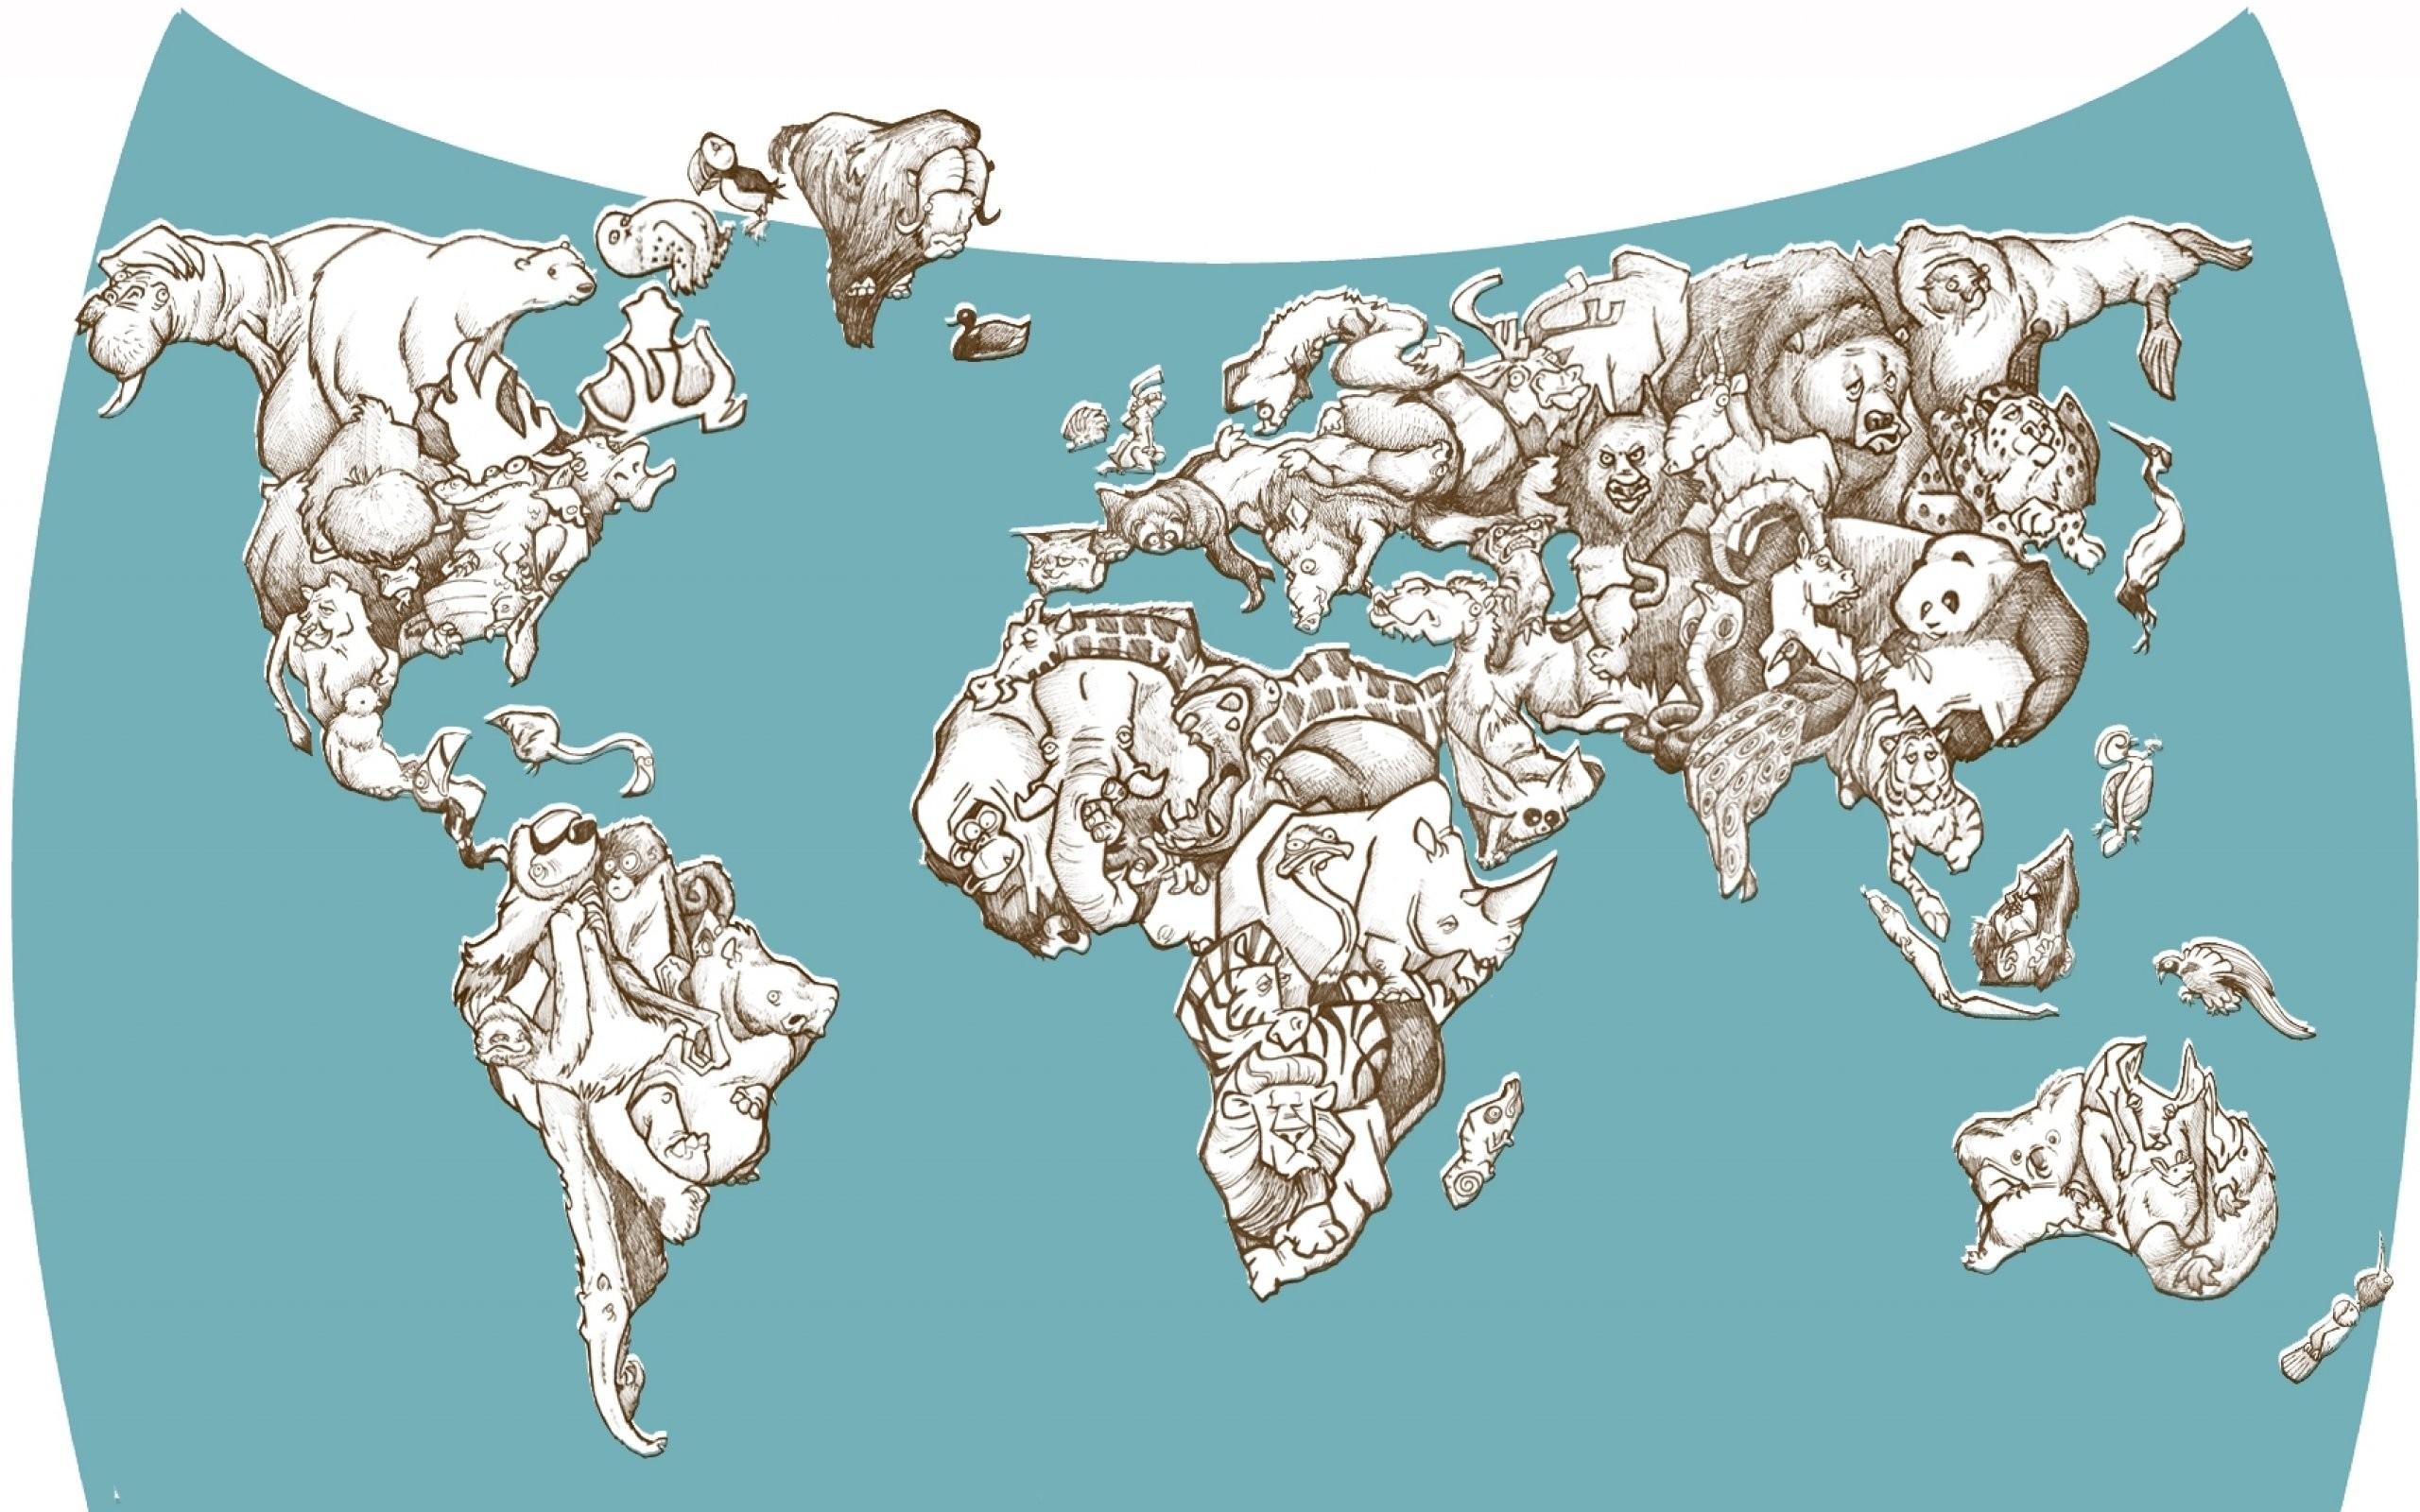 Desktop Backgrounds World Map.World Map Screensaver Wallpaper 56 Images